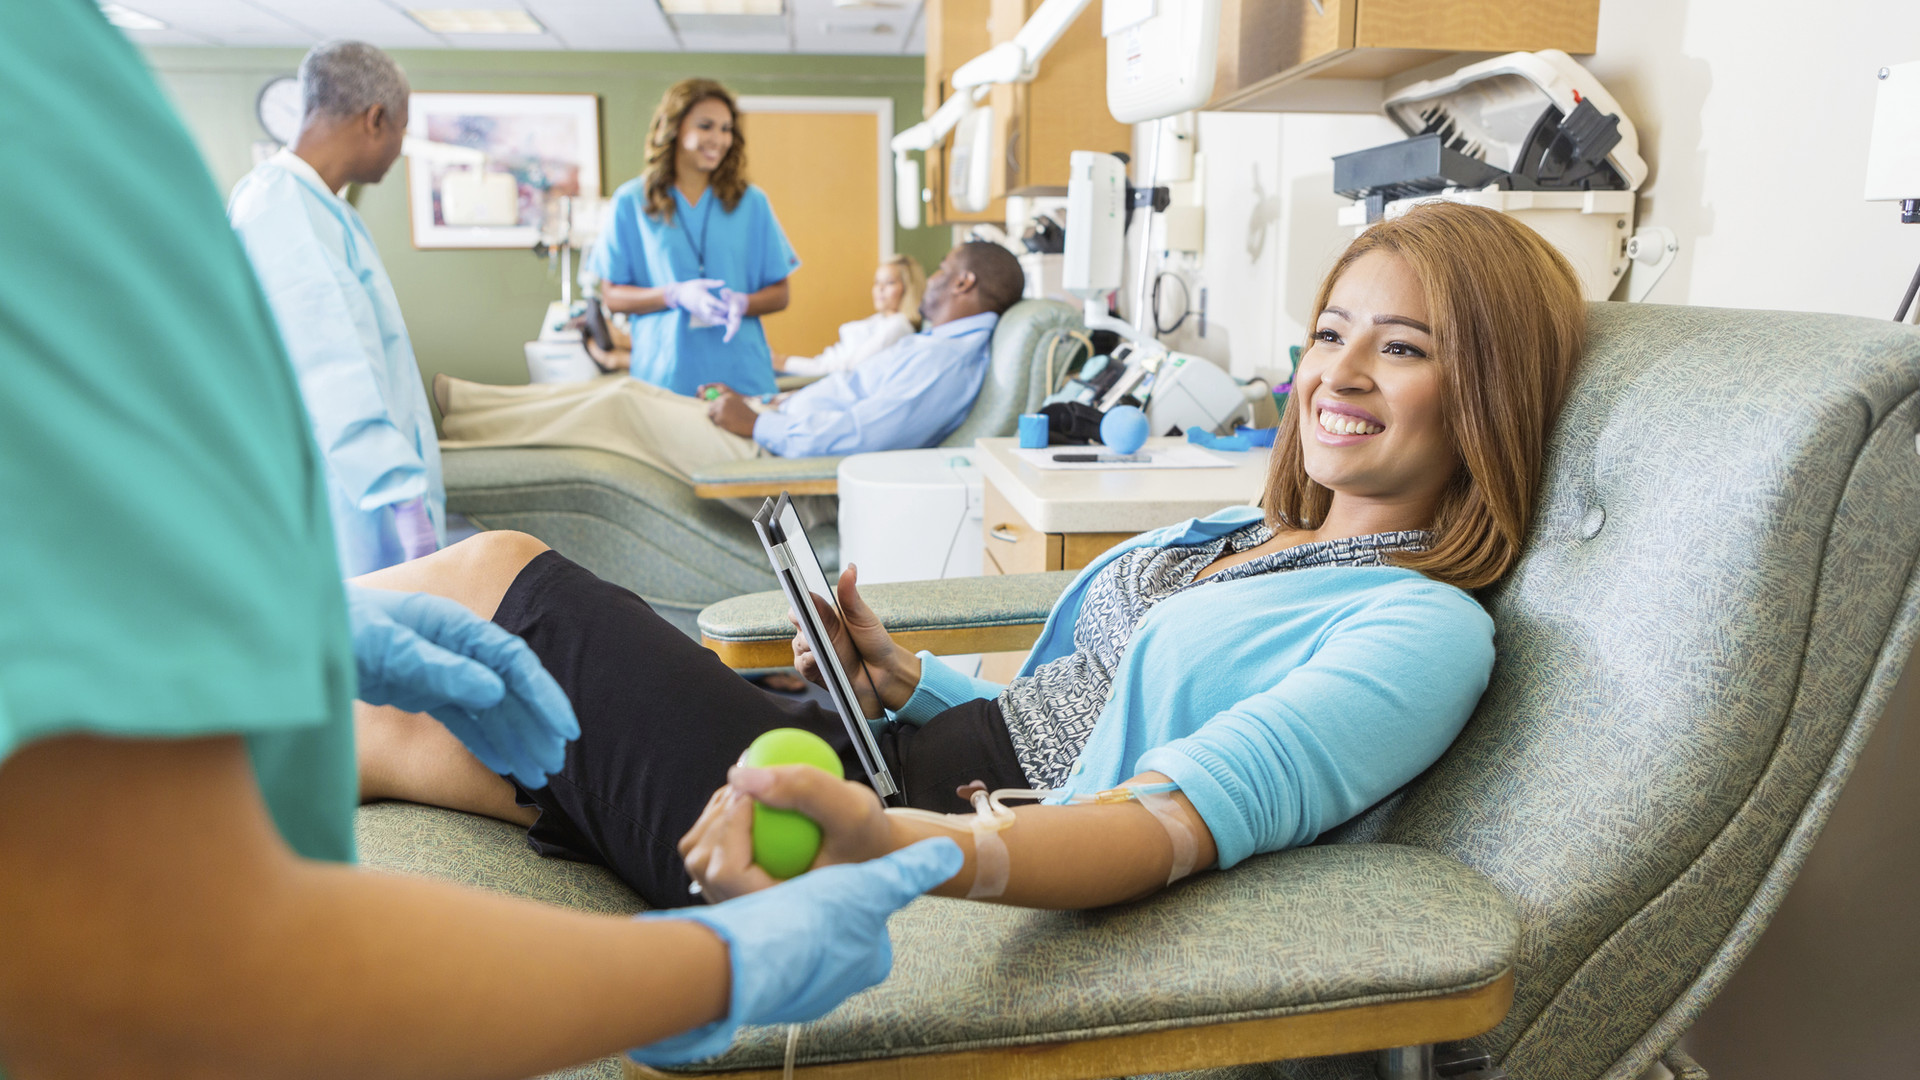 Woman Donating Blood